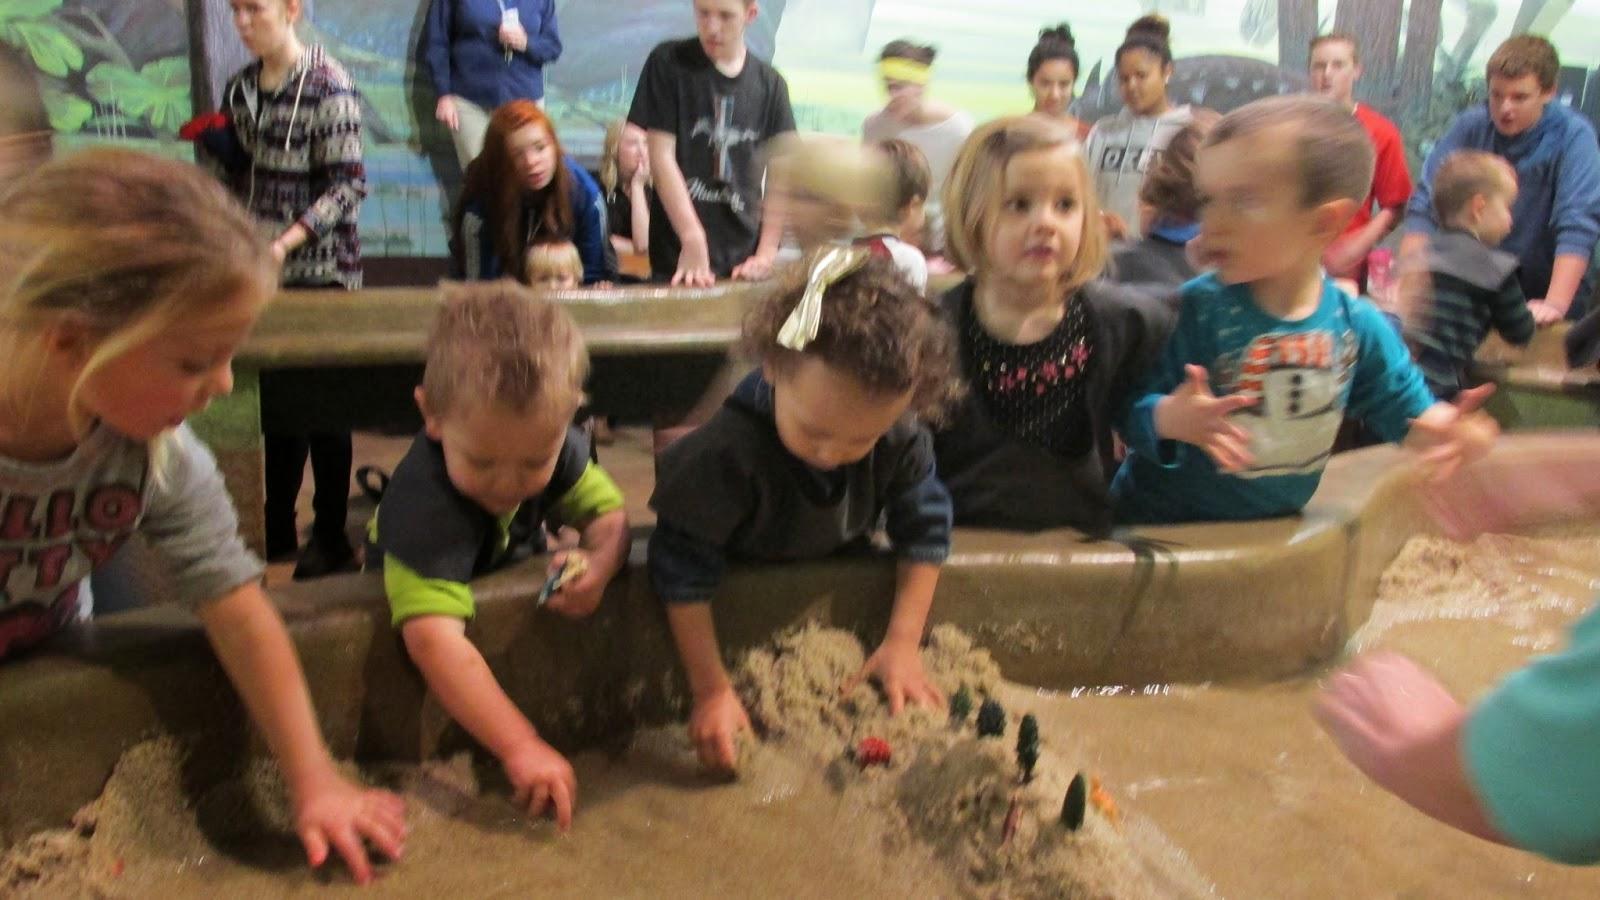 Timpanogos Weewolves Childcare Amp Preschool